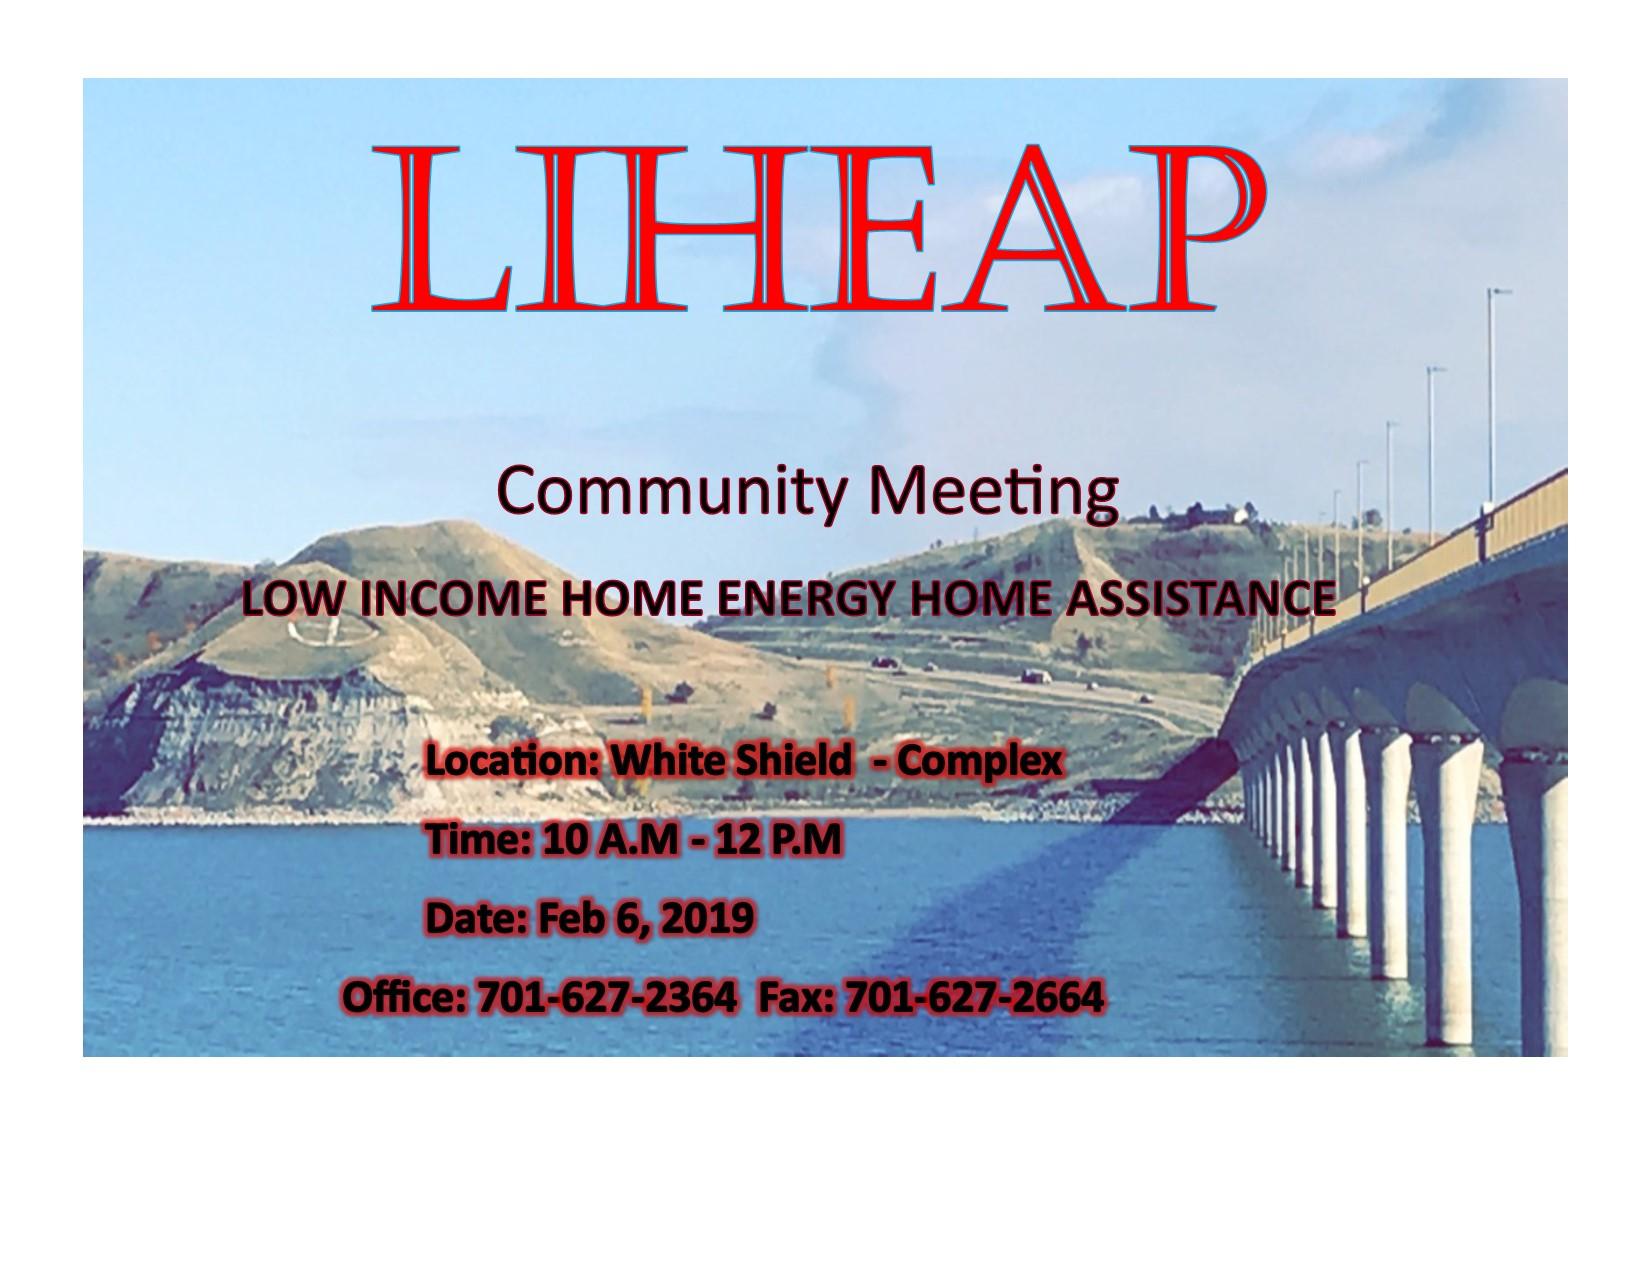 LIHEAP Community Meeting WS Feb 6 2019.jpg